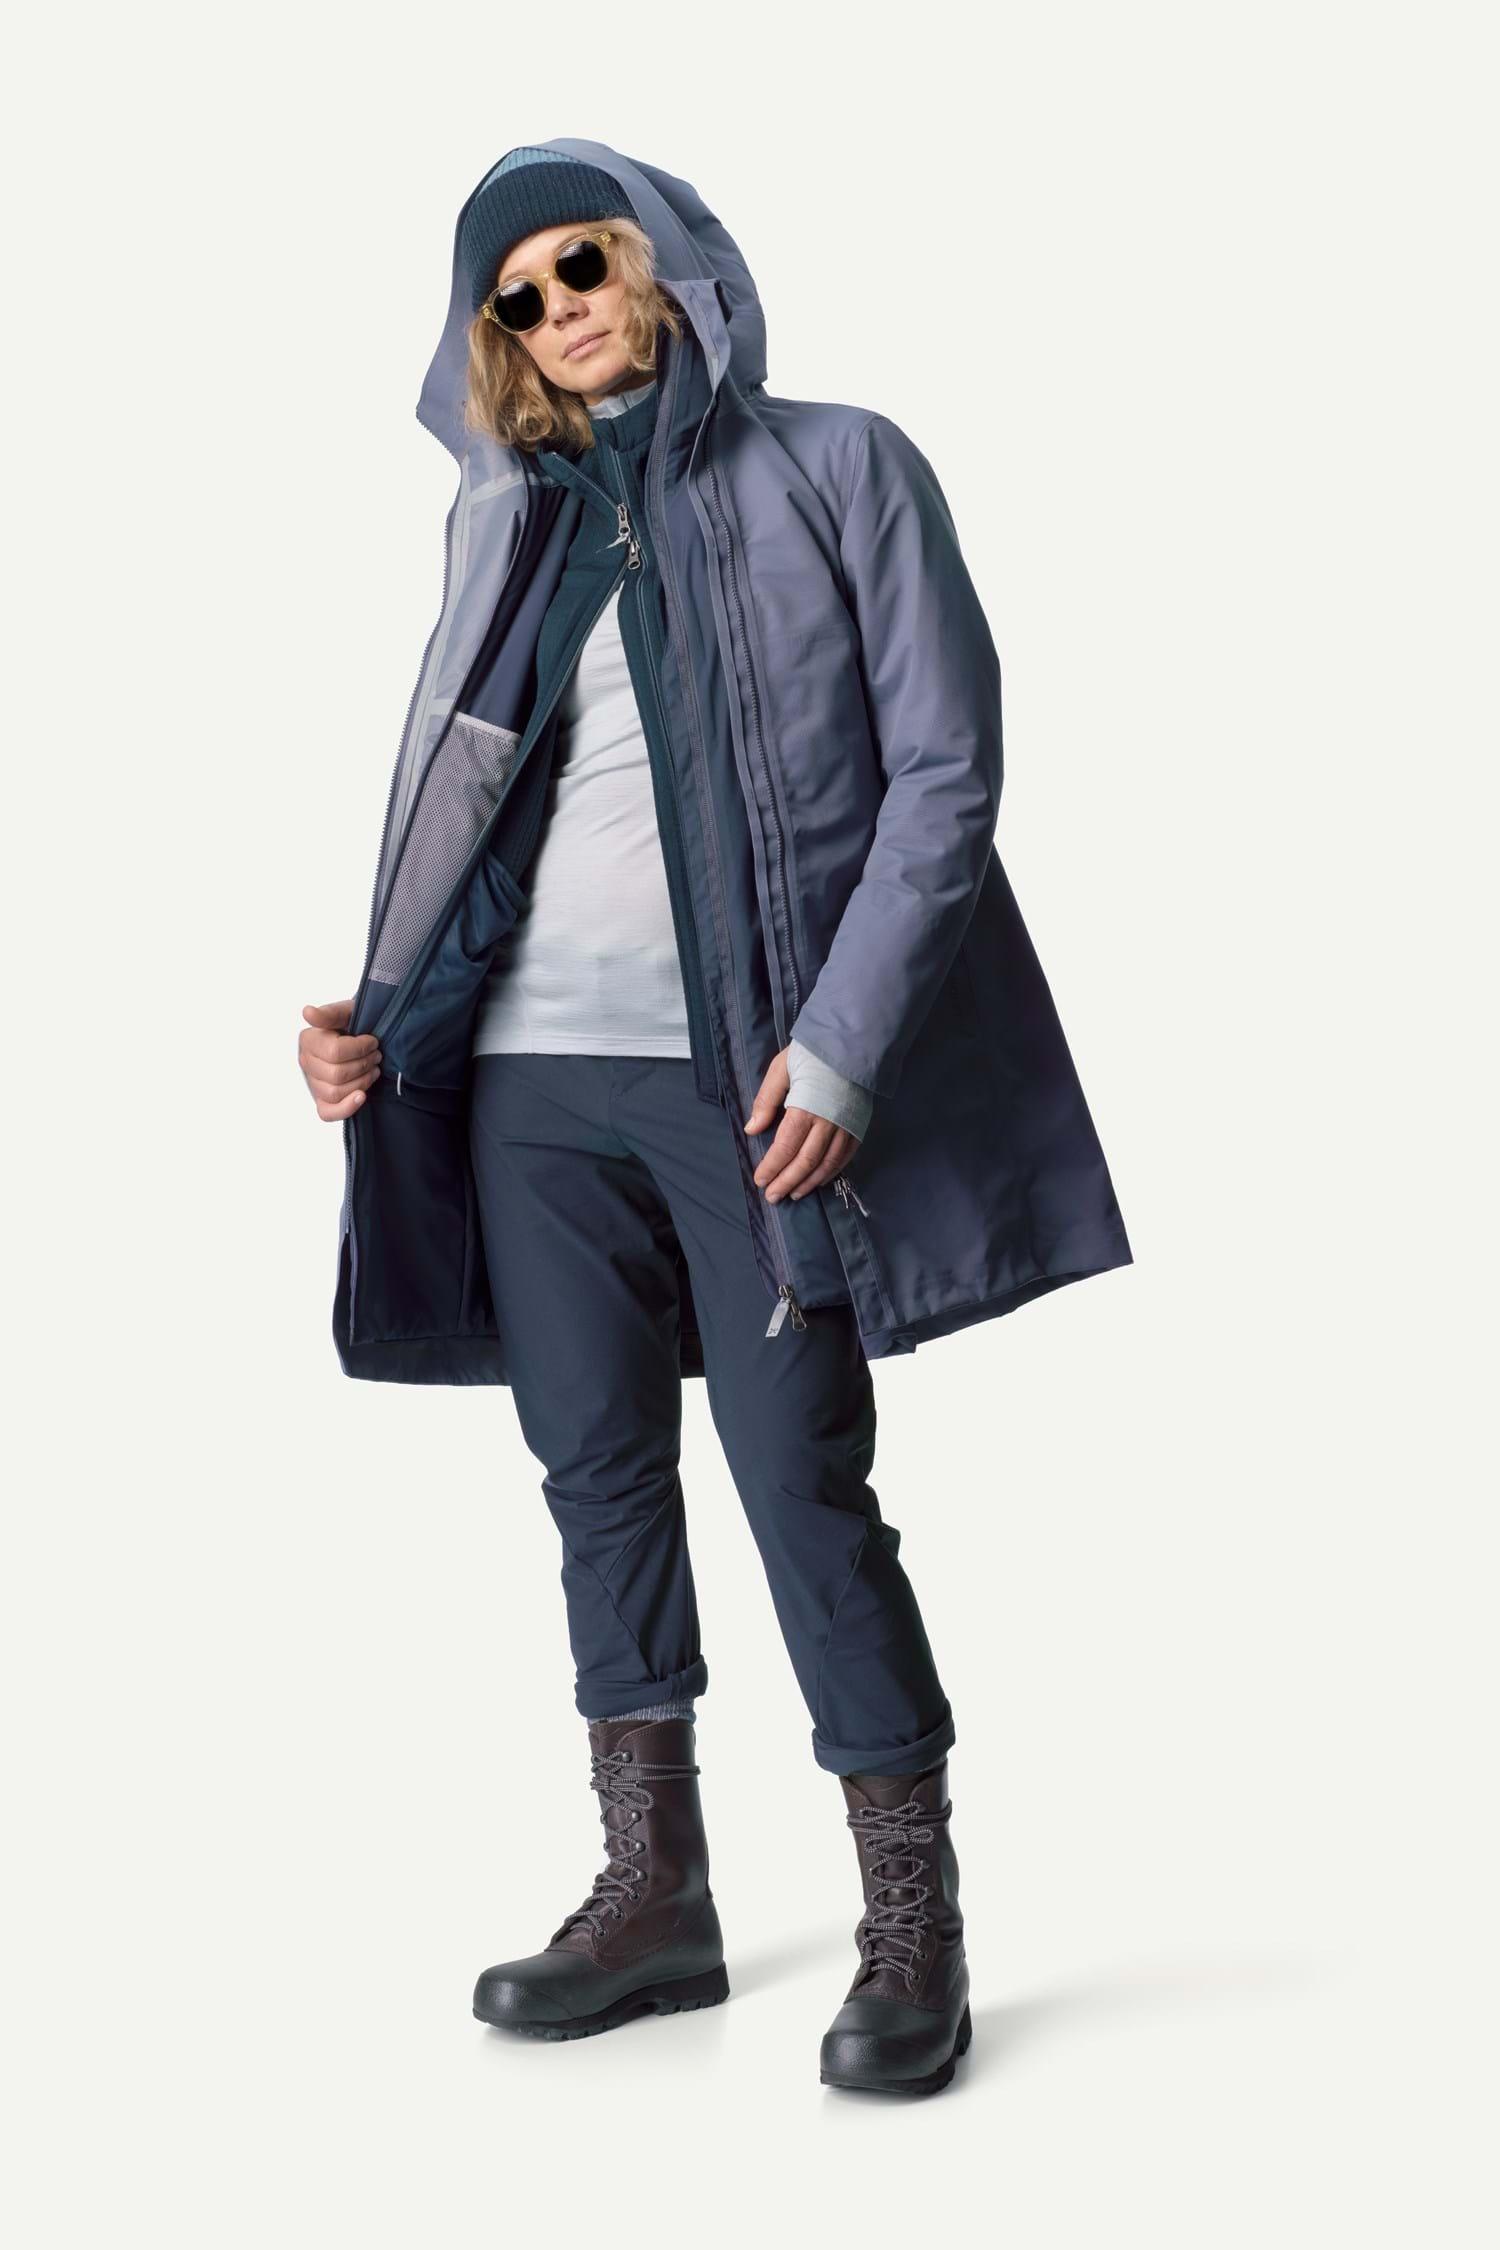 Helt nya Shop Women's Jackets - Houdini Sportswear official website QA-64